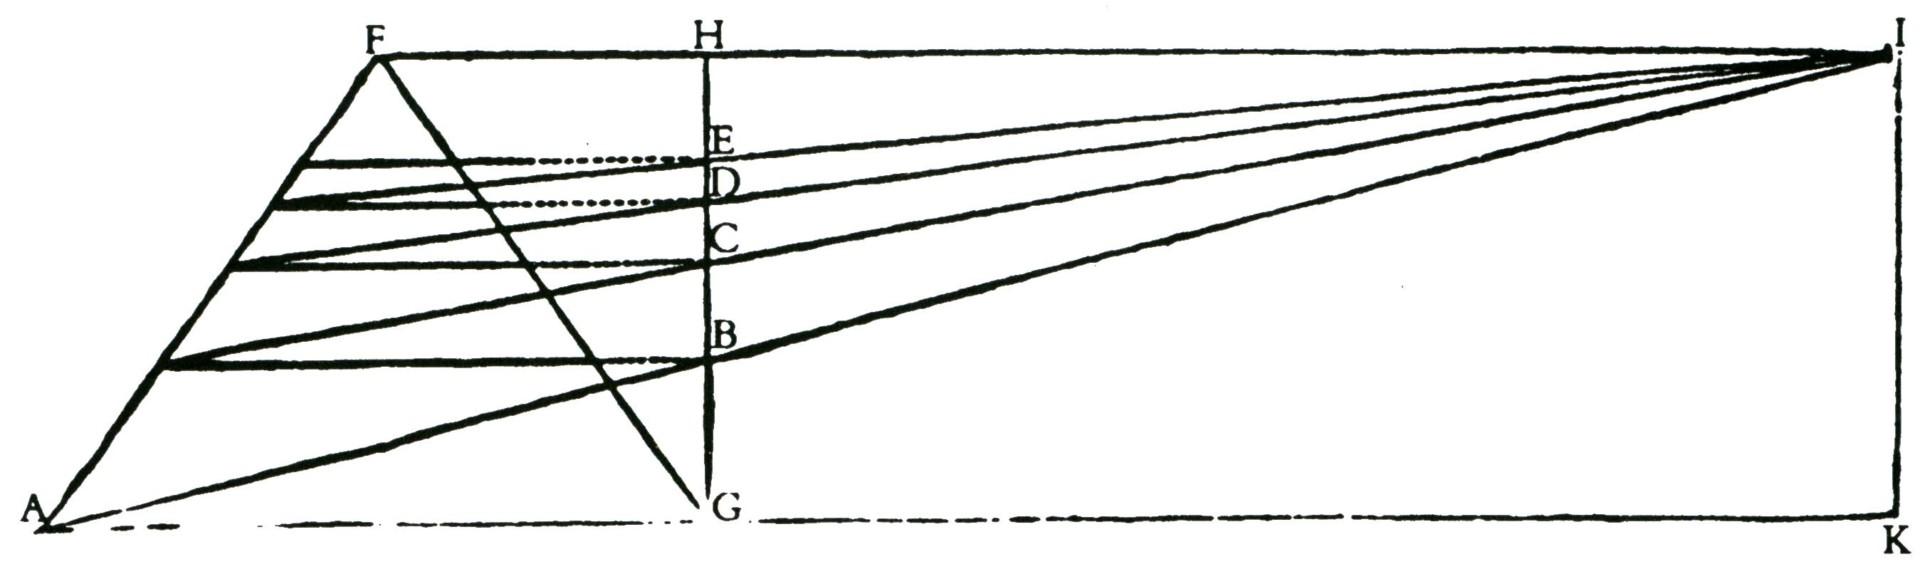 THE BREAKDOWN OF THE PROMENADE: image 12